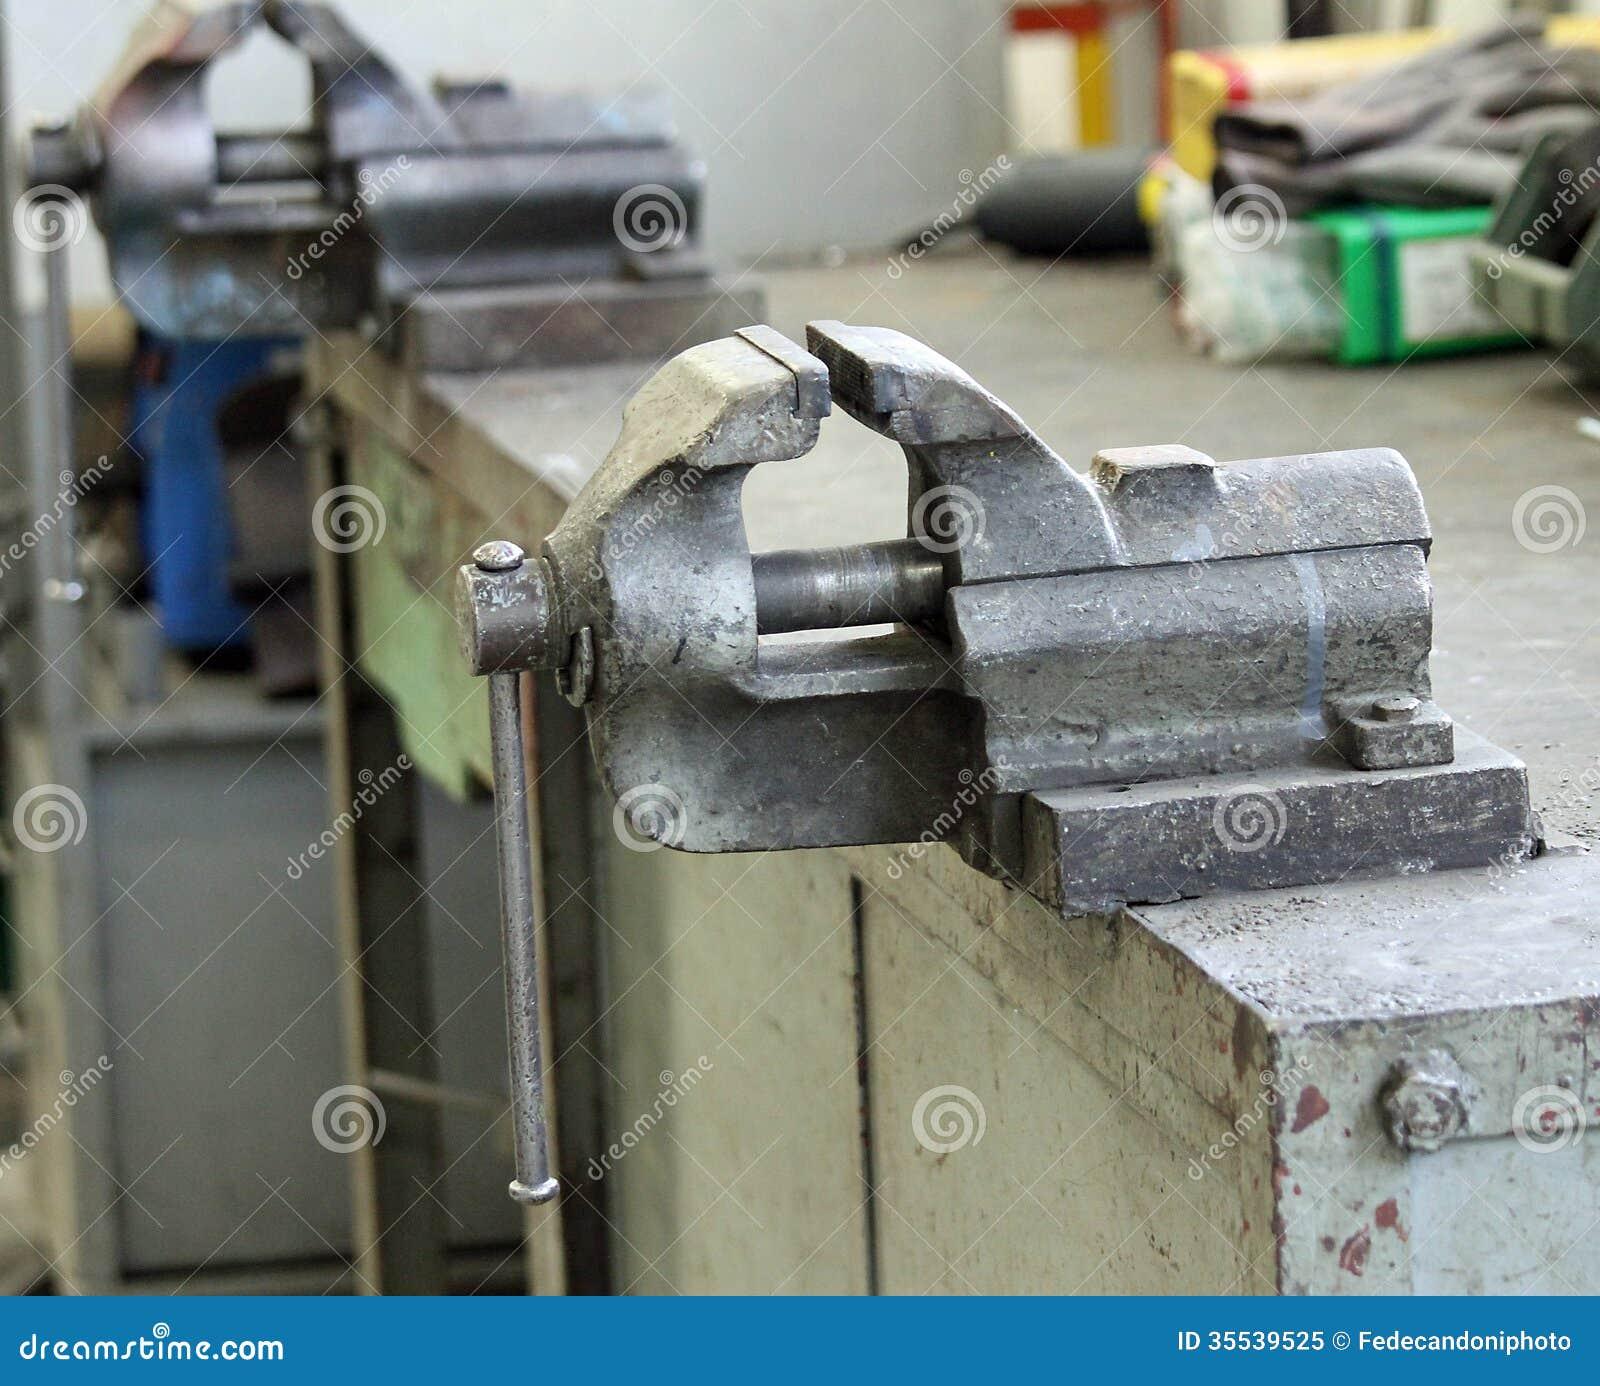 Bancada Dentro De Uma Oficina Mecânica Foto de Stock Royalty Free  #374861 1300x1143